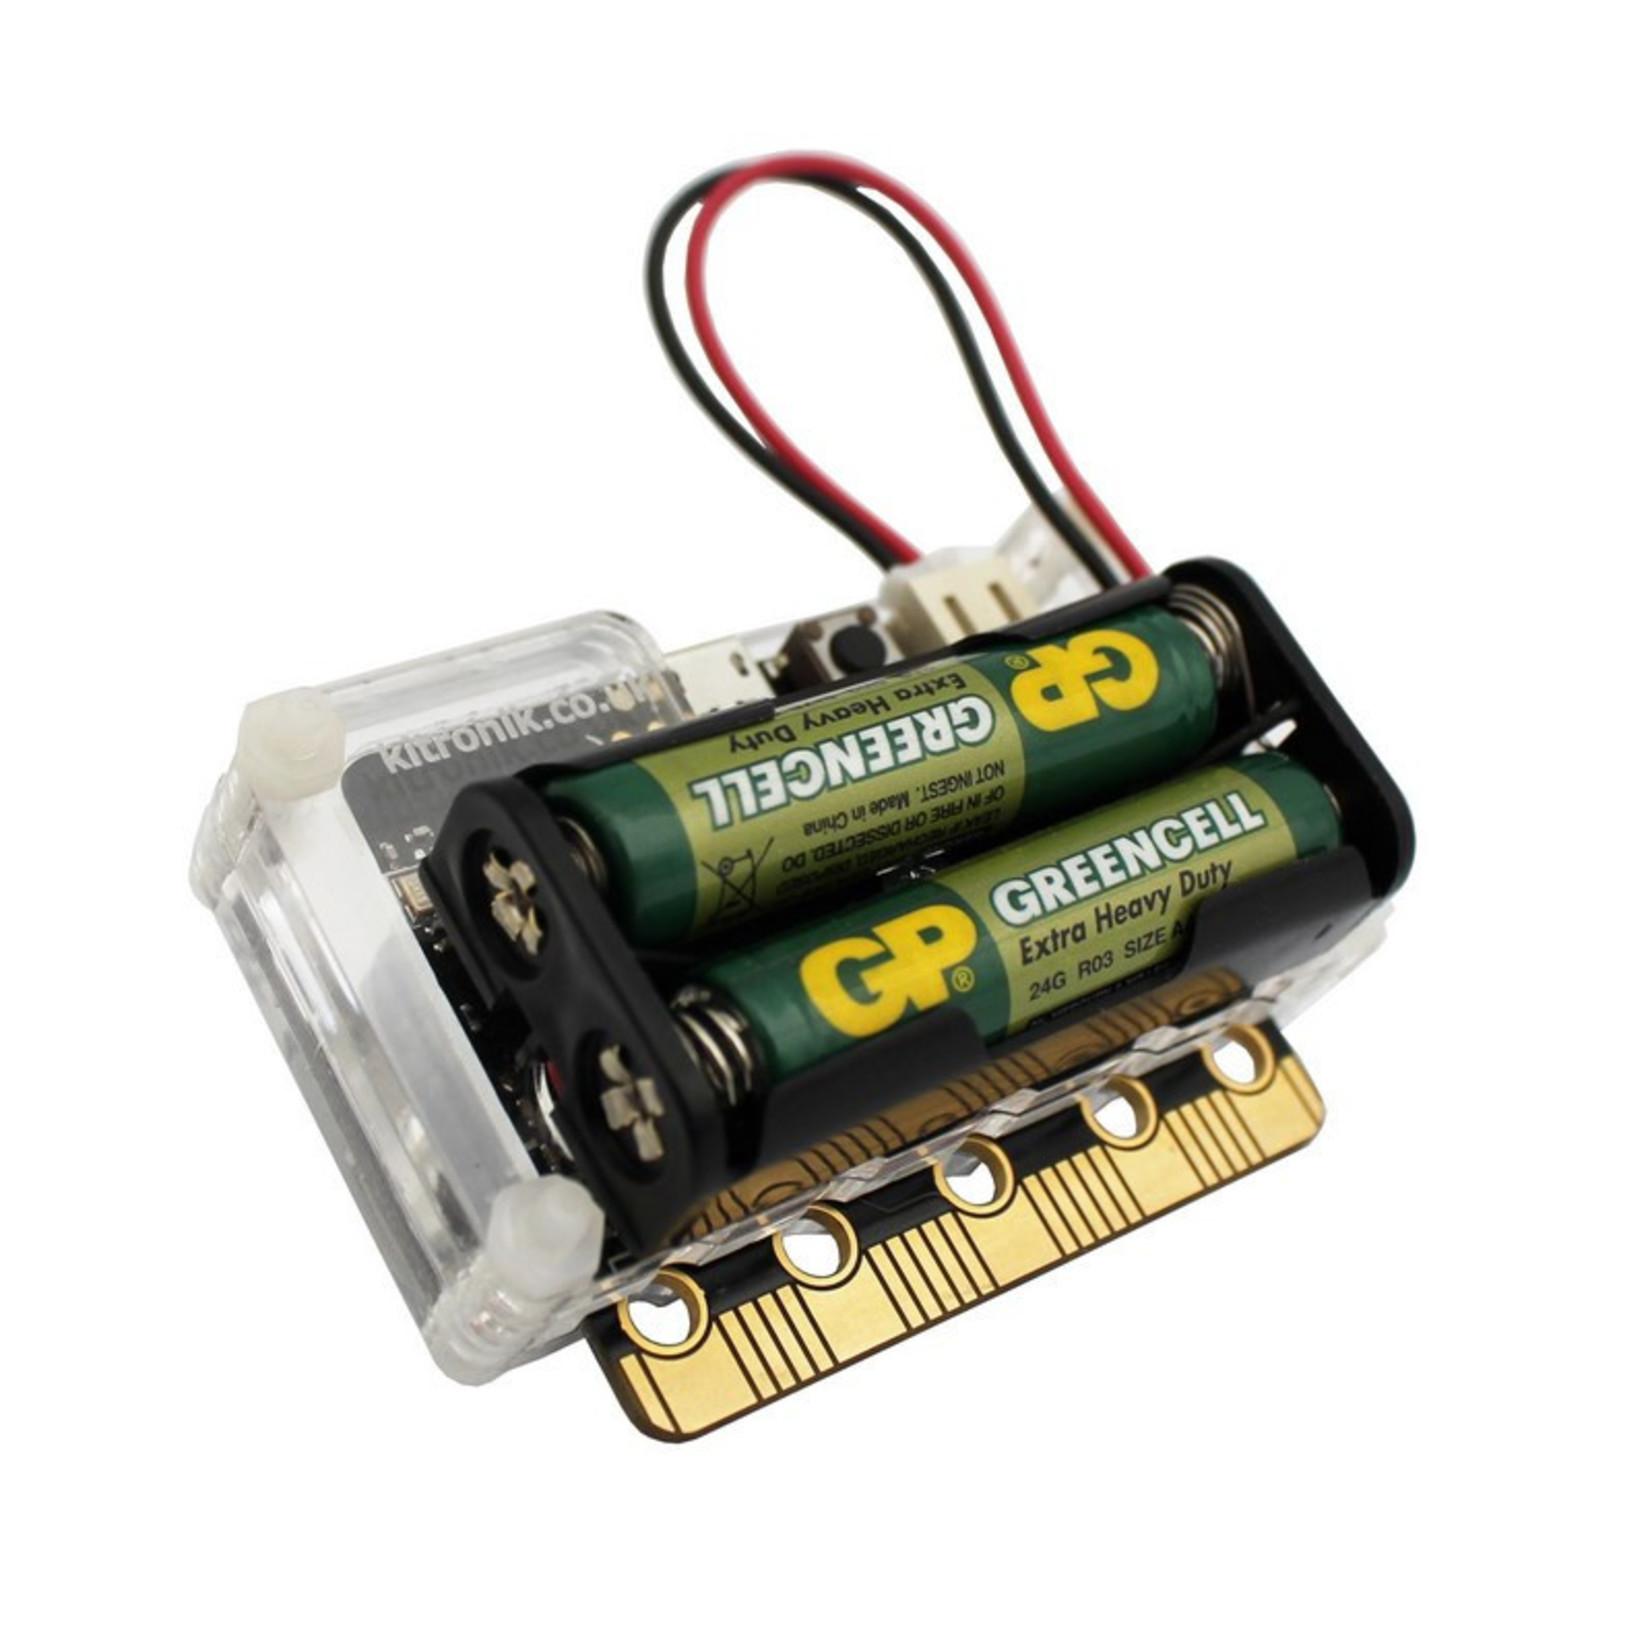 Kitronik MI:pro Protector Case for the BBC micro:bit - Green